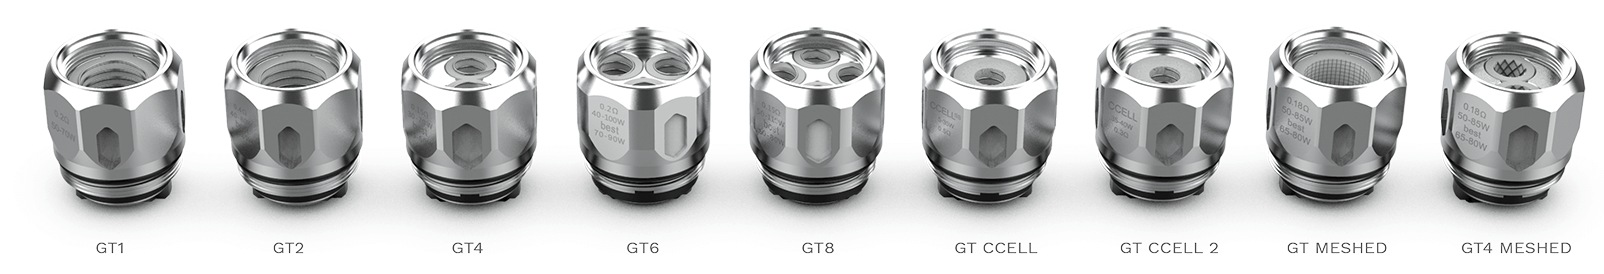 Vaporesso Gen X Kit | NRG-S Tank